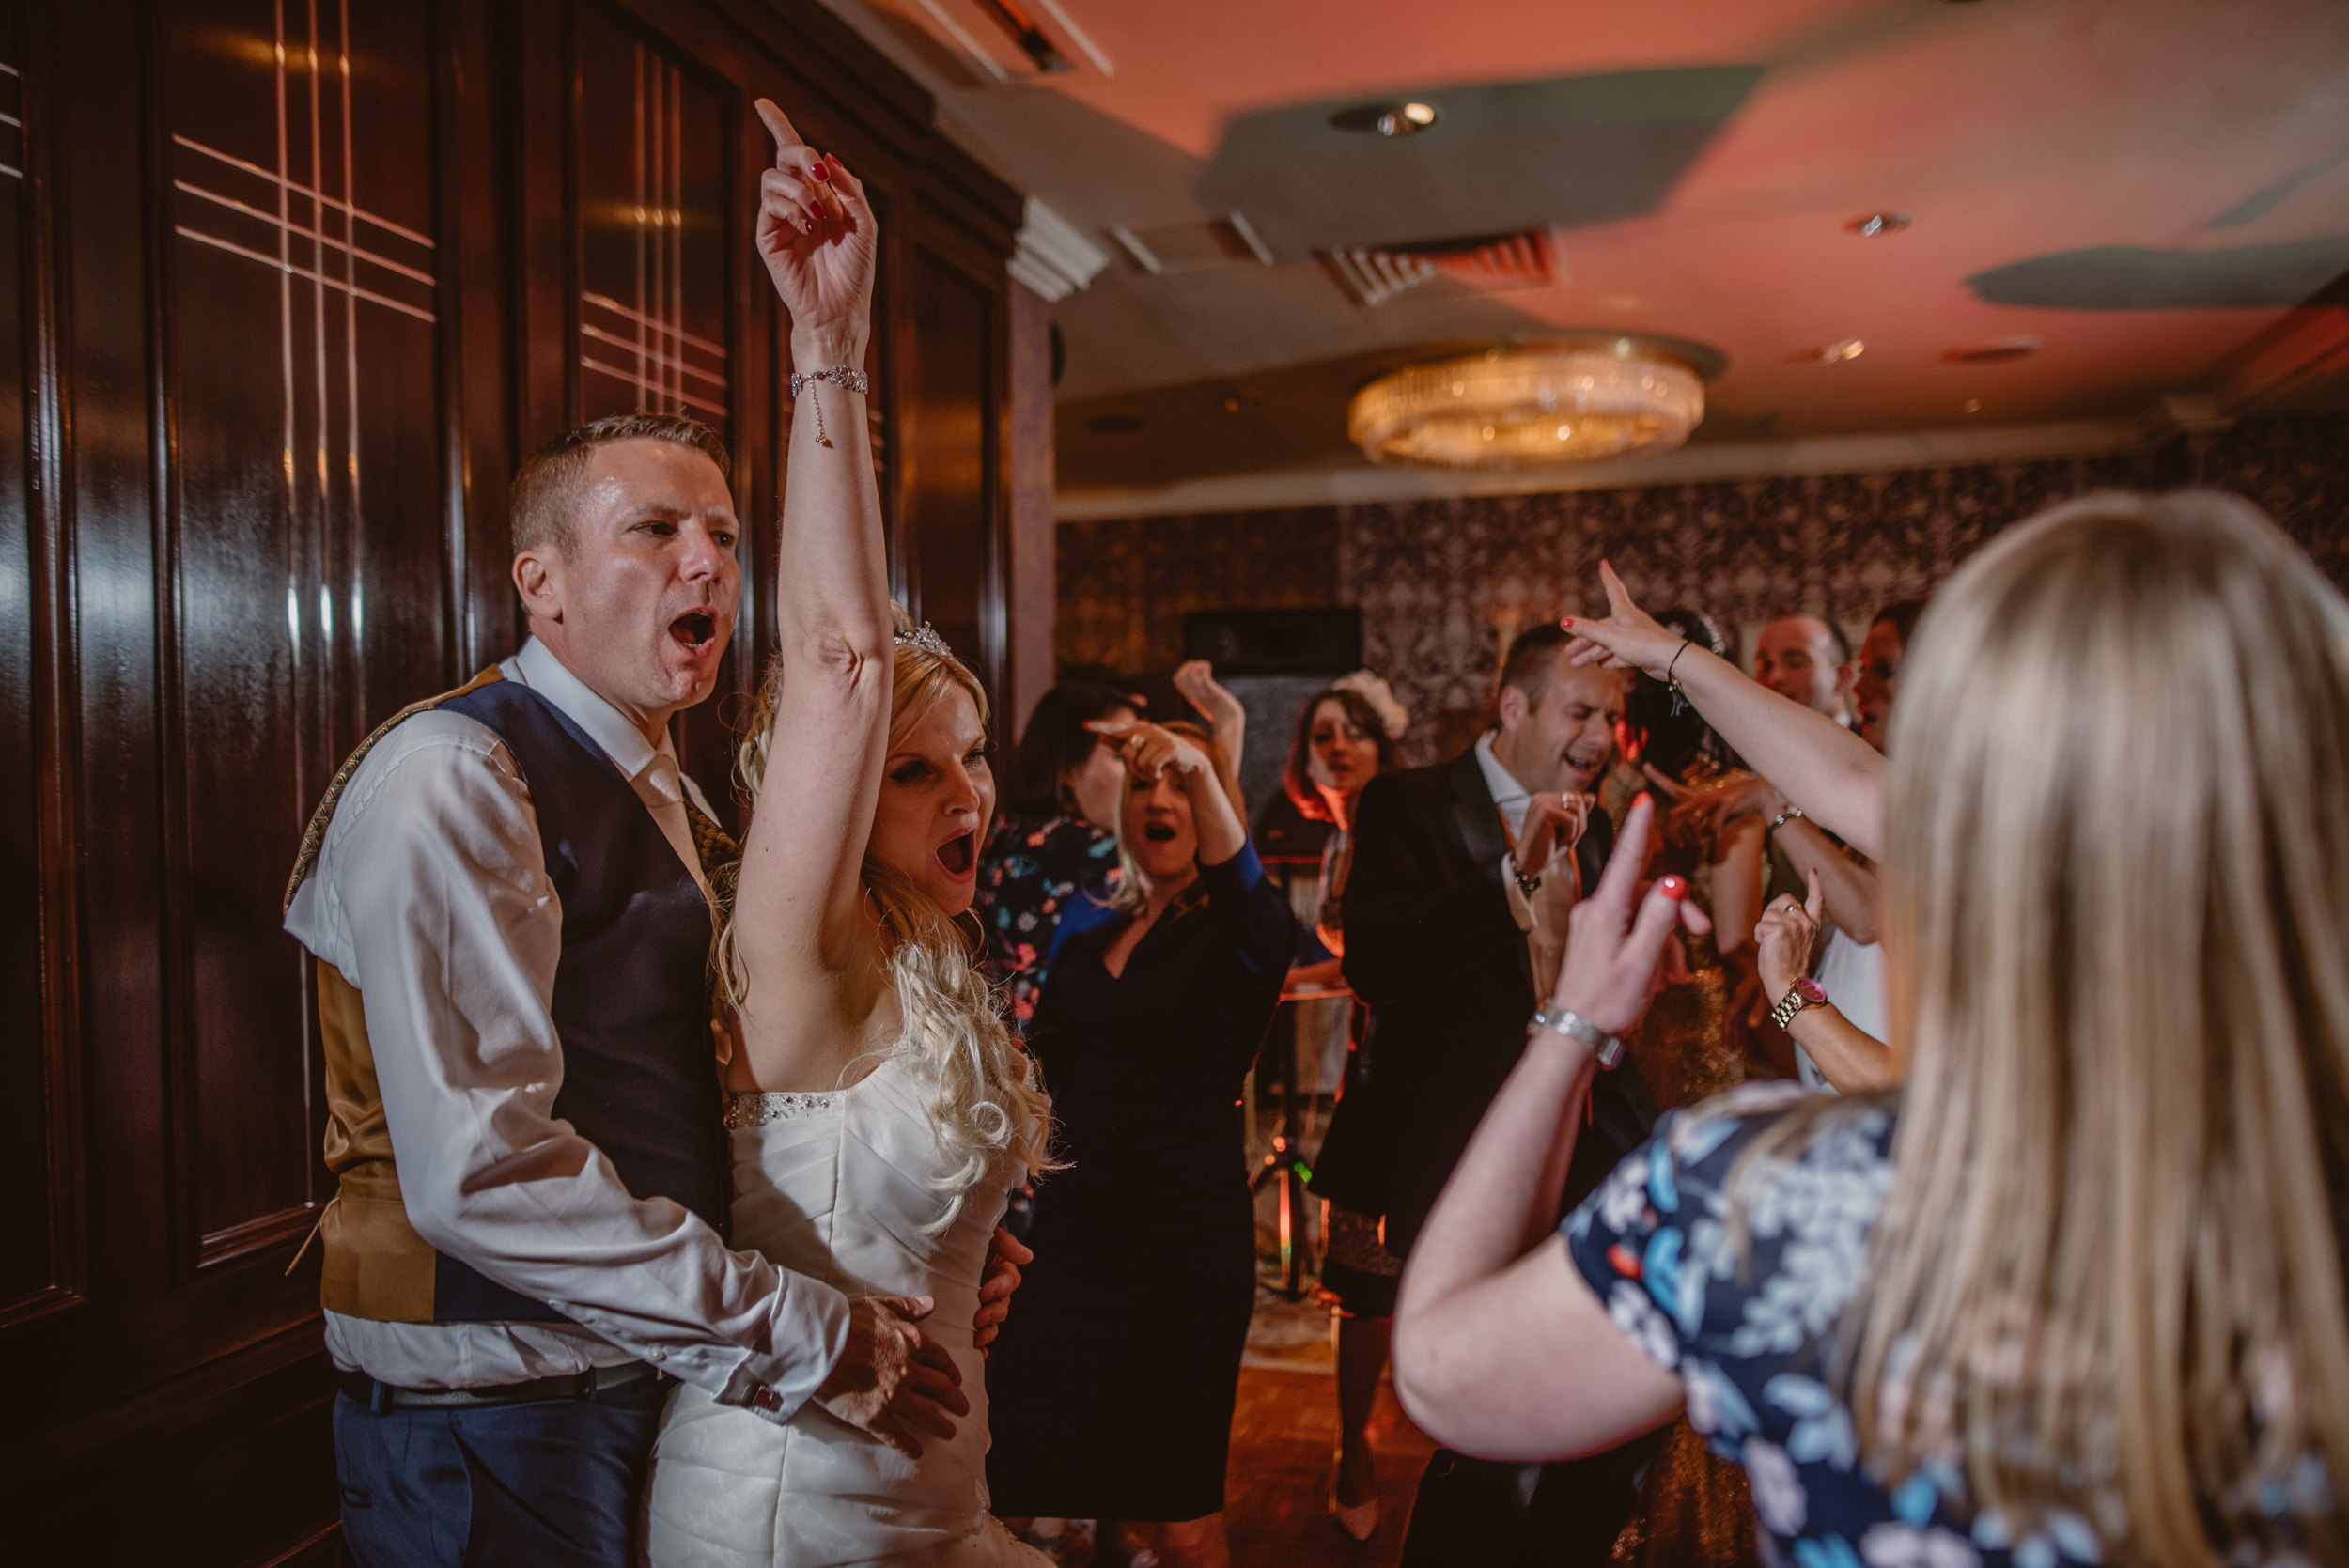 Trisha-and-Roger-wedding-The-Priory-Church-and-Chewton-Glen-Hotel-Christchurch-Manu-Mendoza-Wedding-Photography-531.jpg